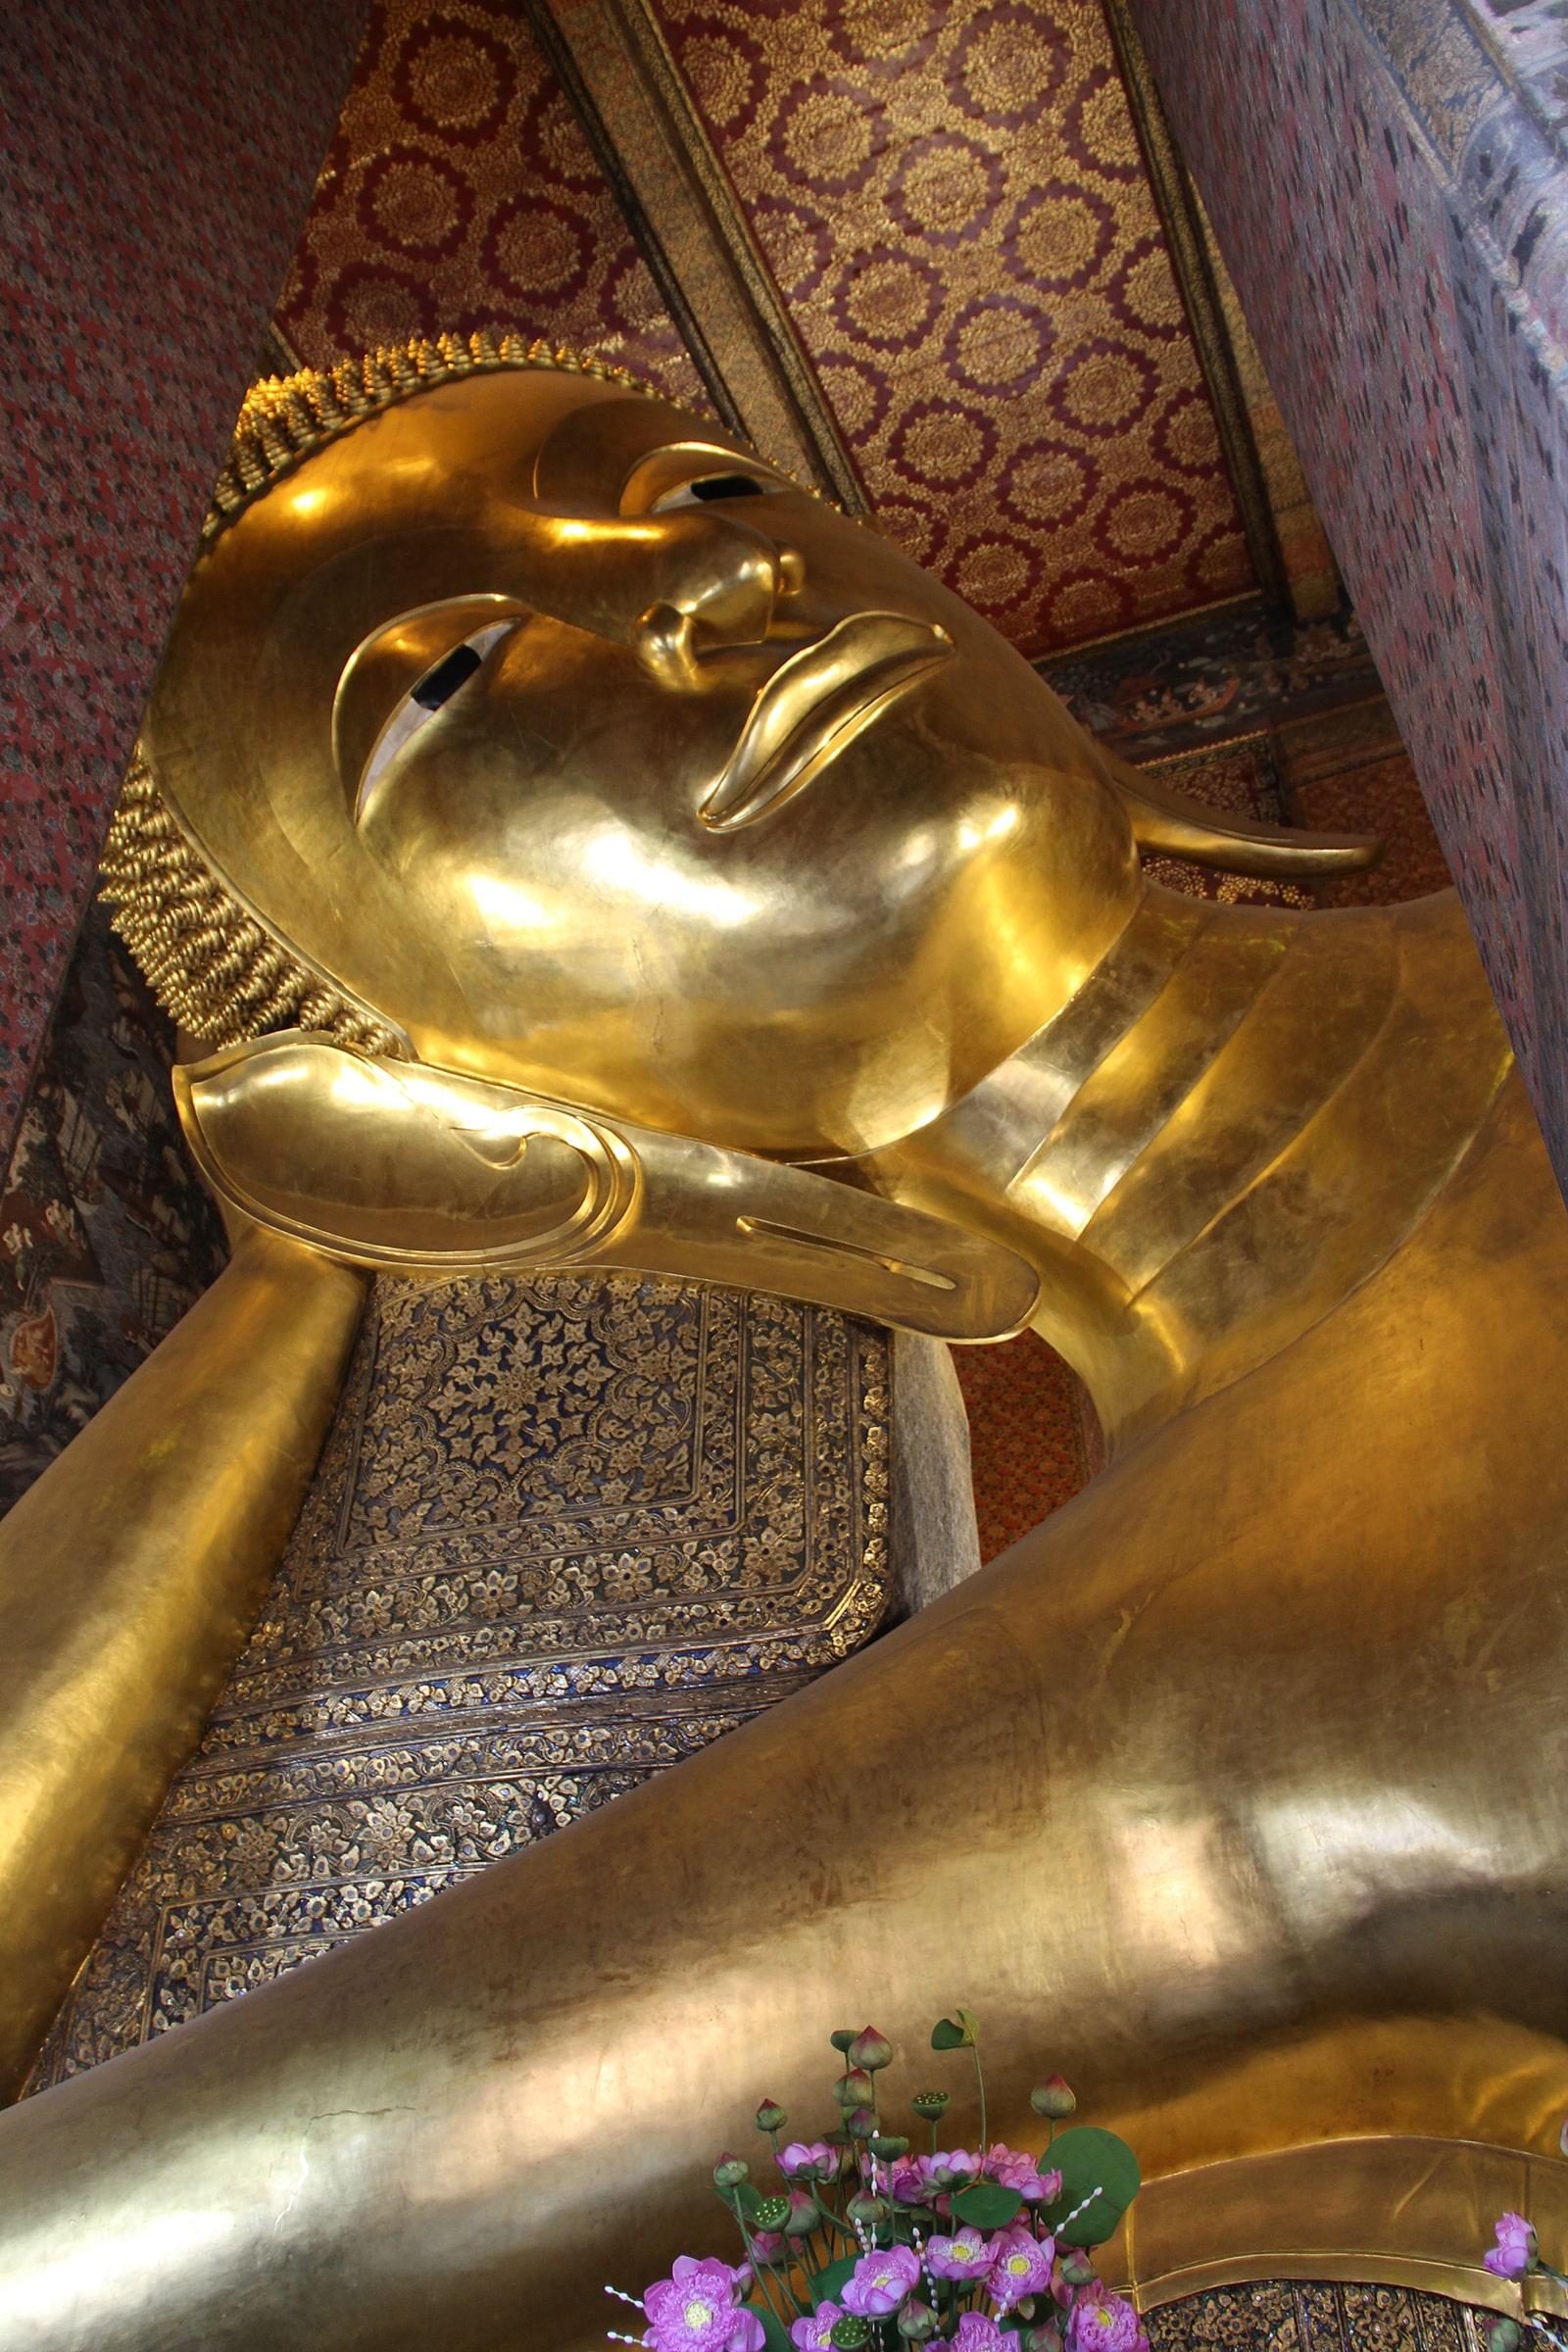 Testa del Buddha sdraiato - Wat Pho, Bangkok